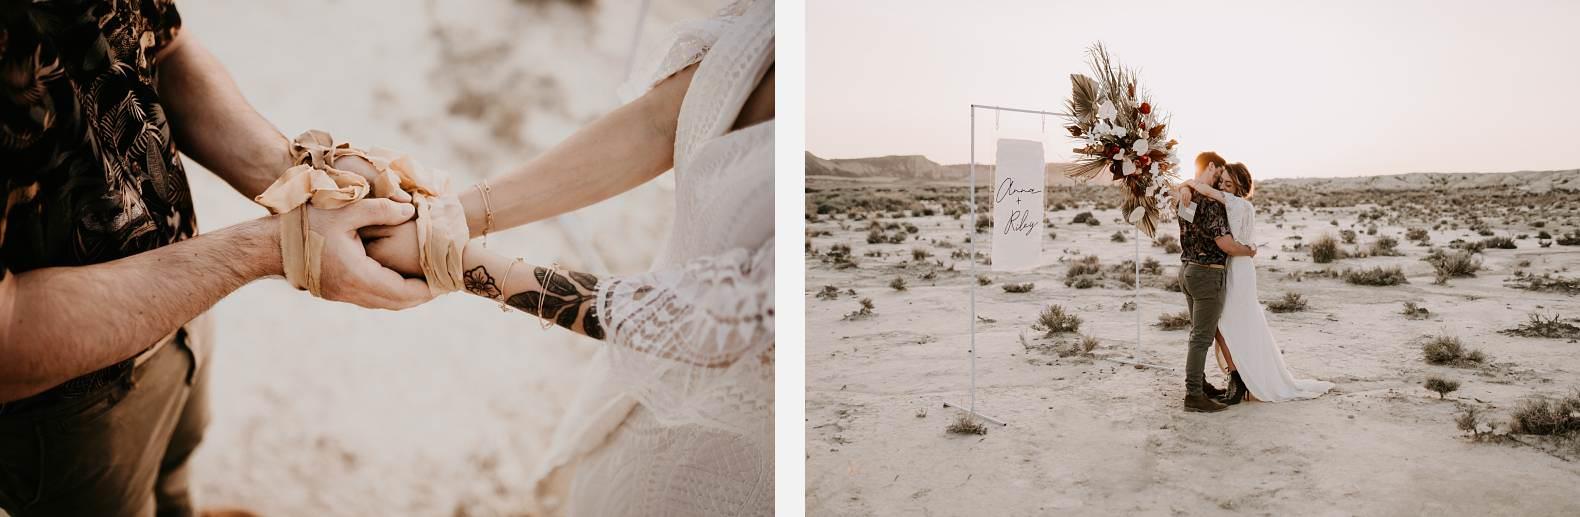 mariage espagne bardenas festival you and me elopement photographe bel esprit desert 0048